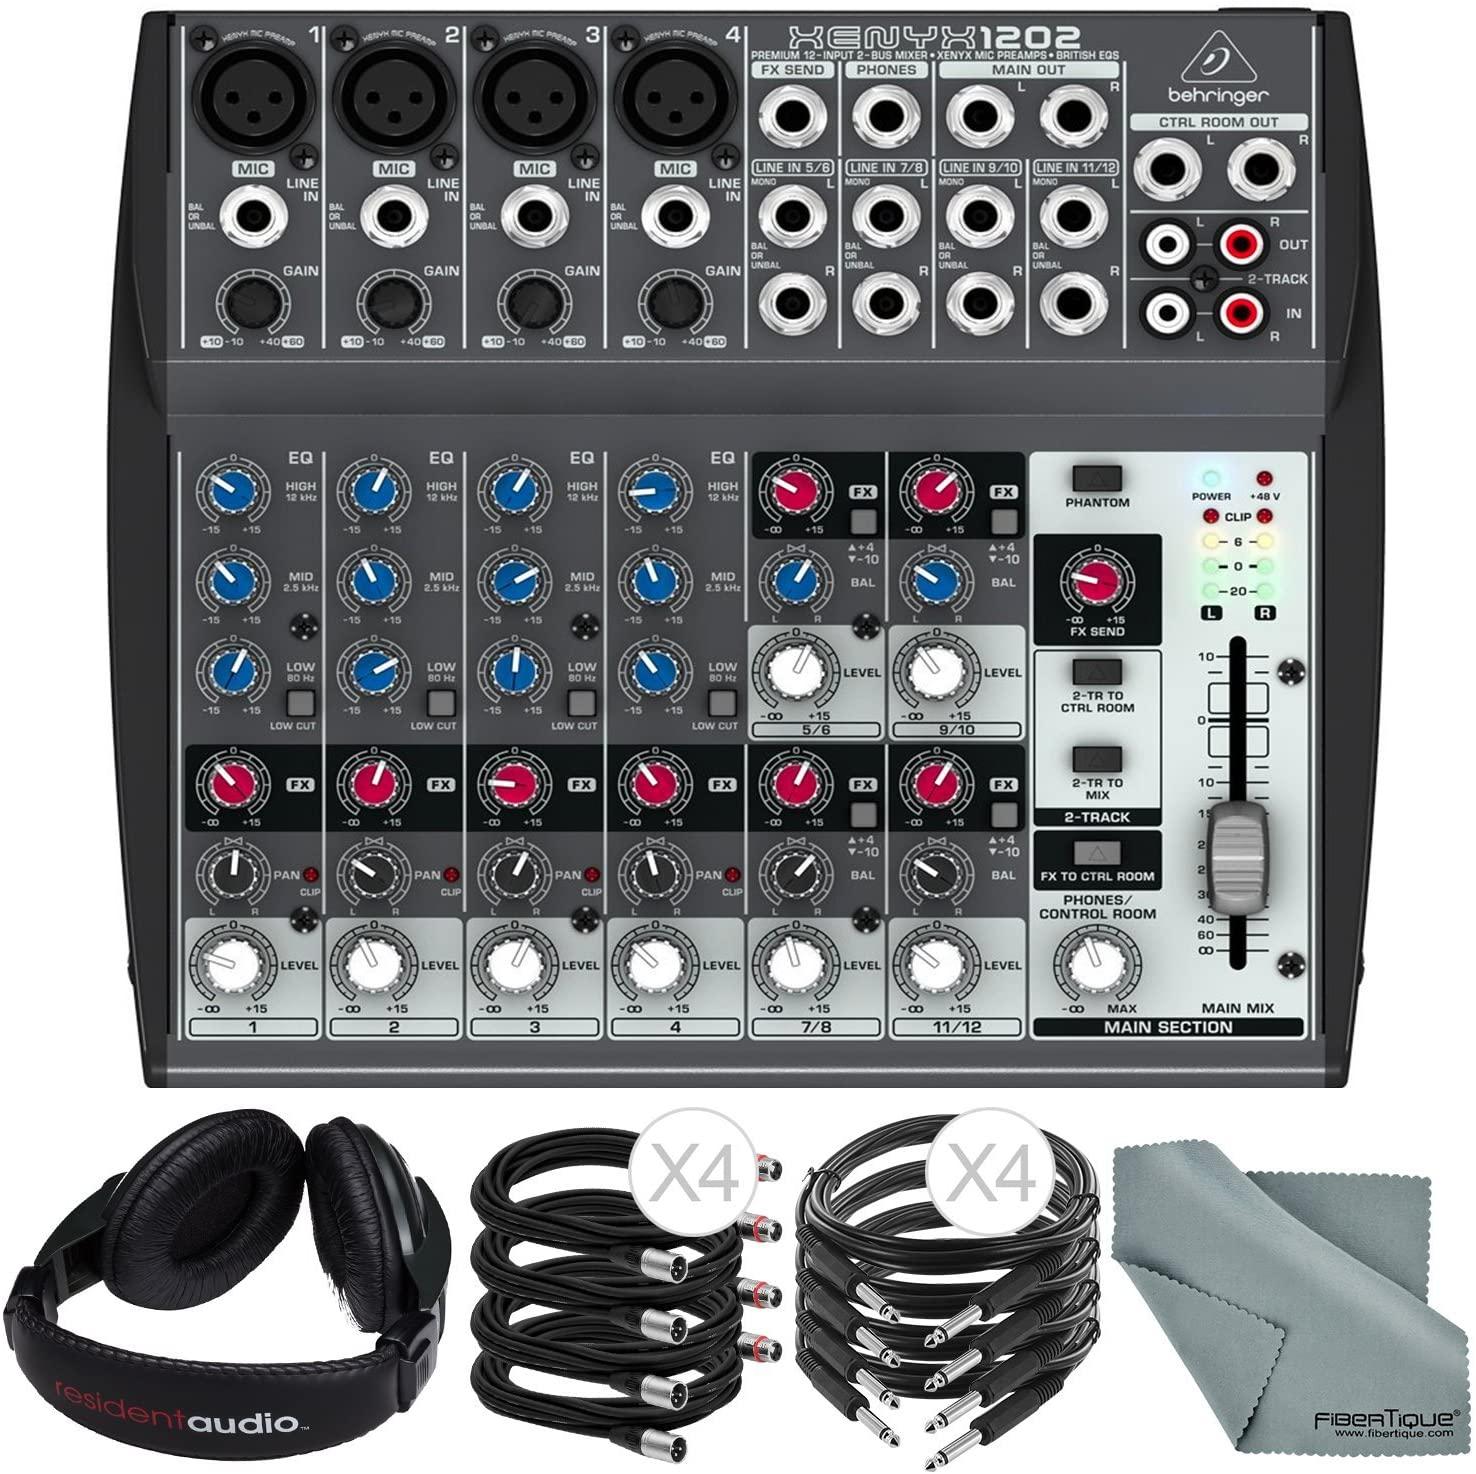 Behringer XENYX 1202 12 Channel Audio Mixer and Bundle w/Closed-Back Headphones + Cables + Fibertique Cloth